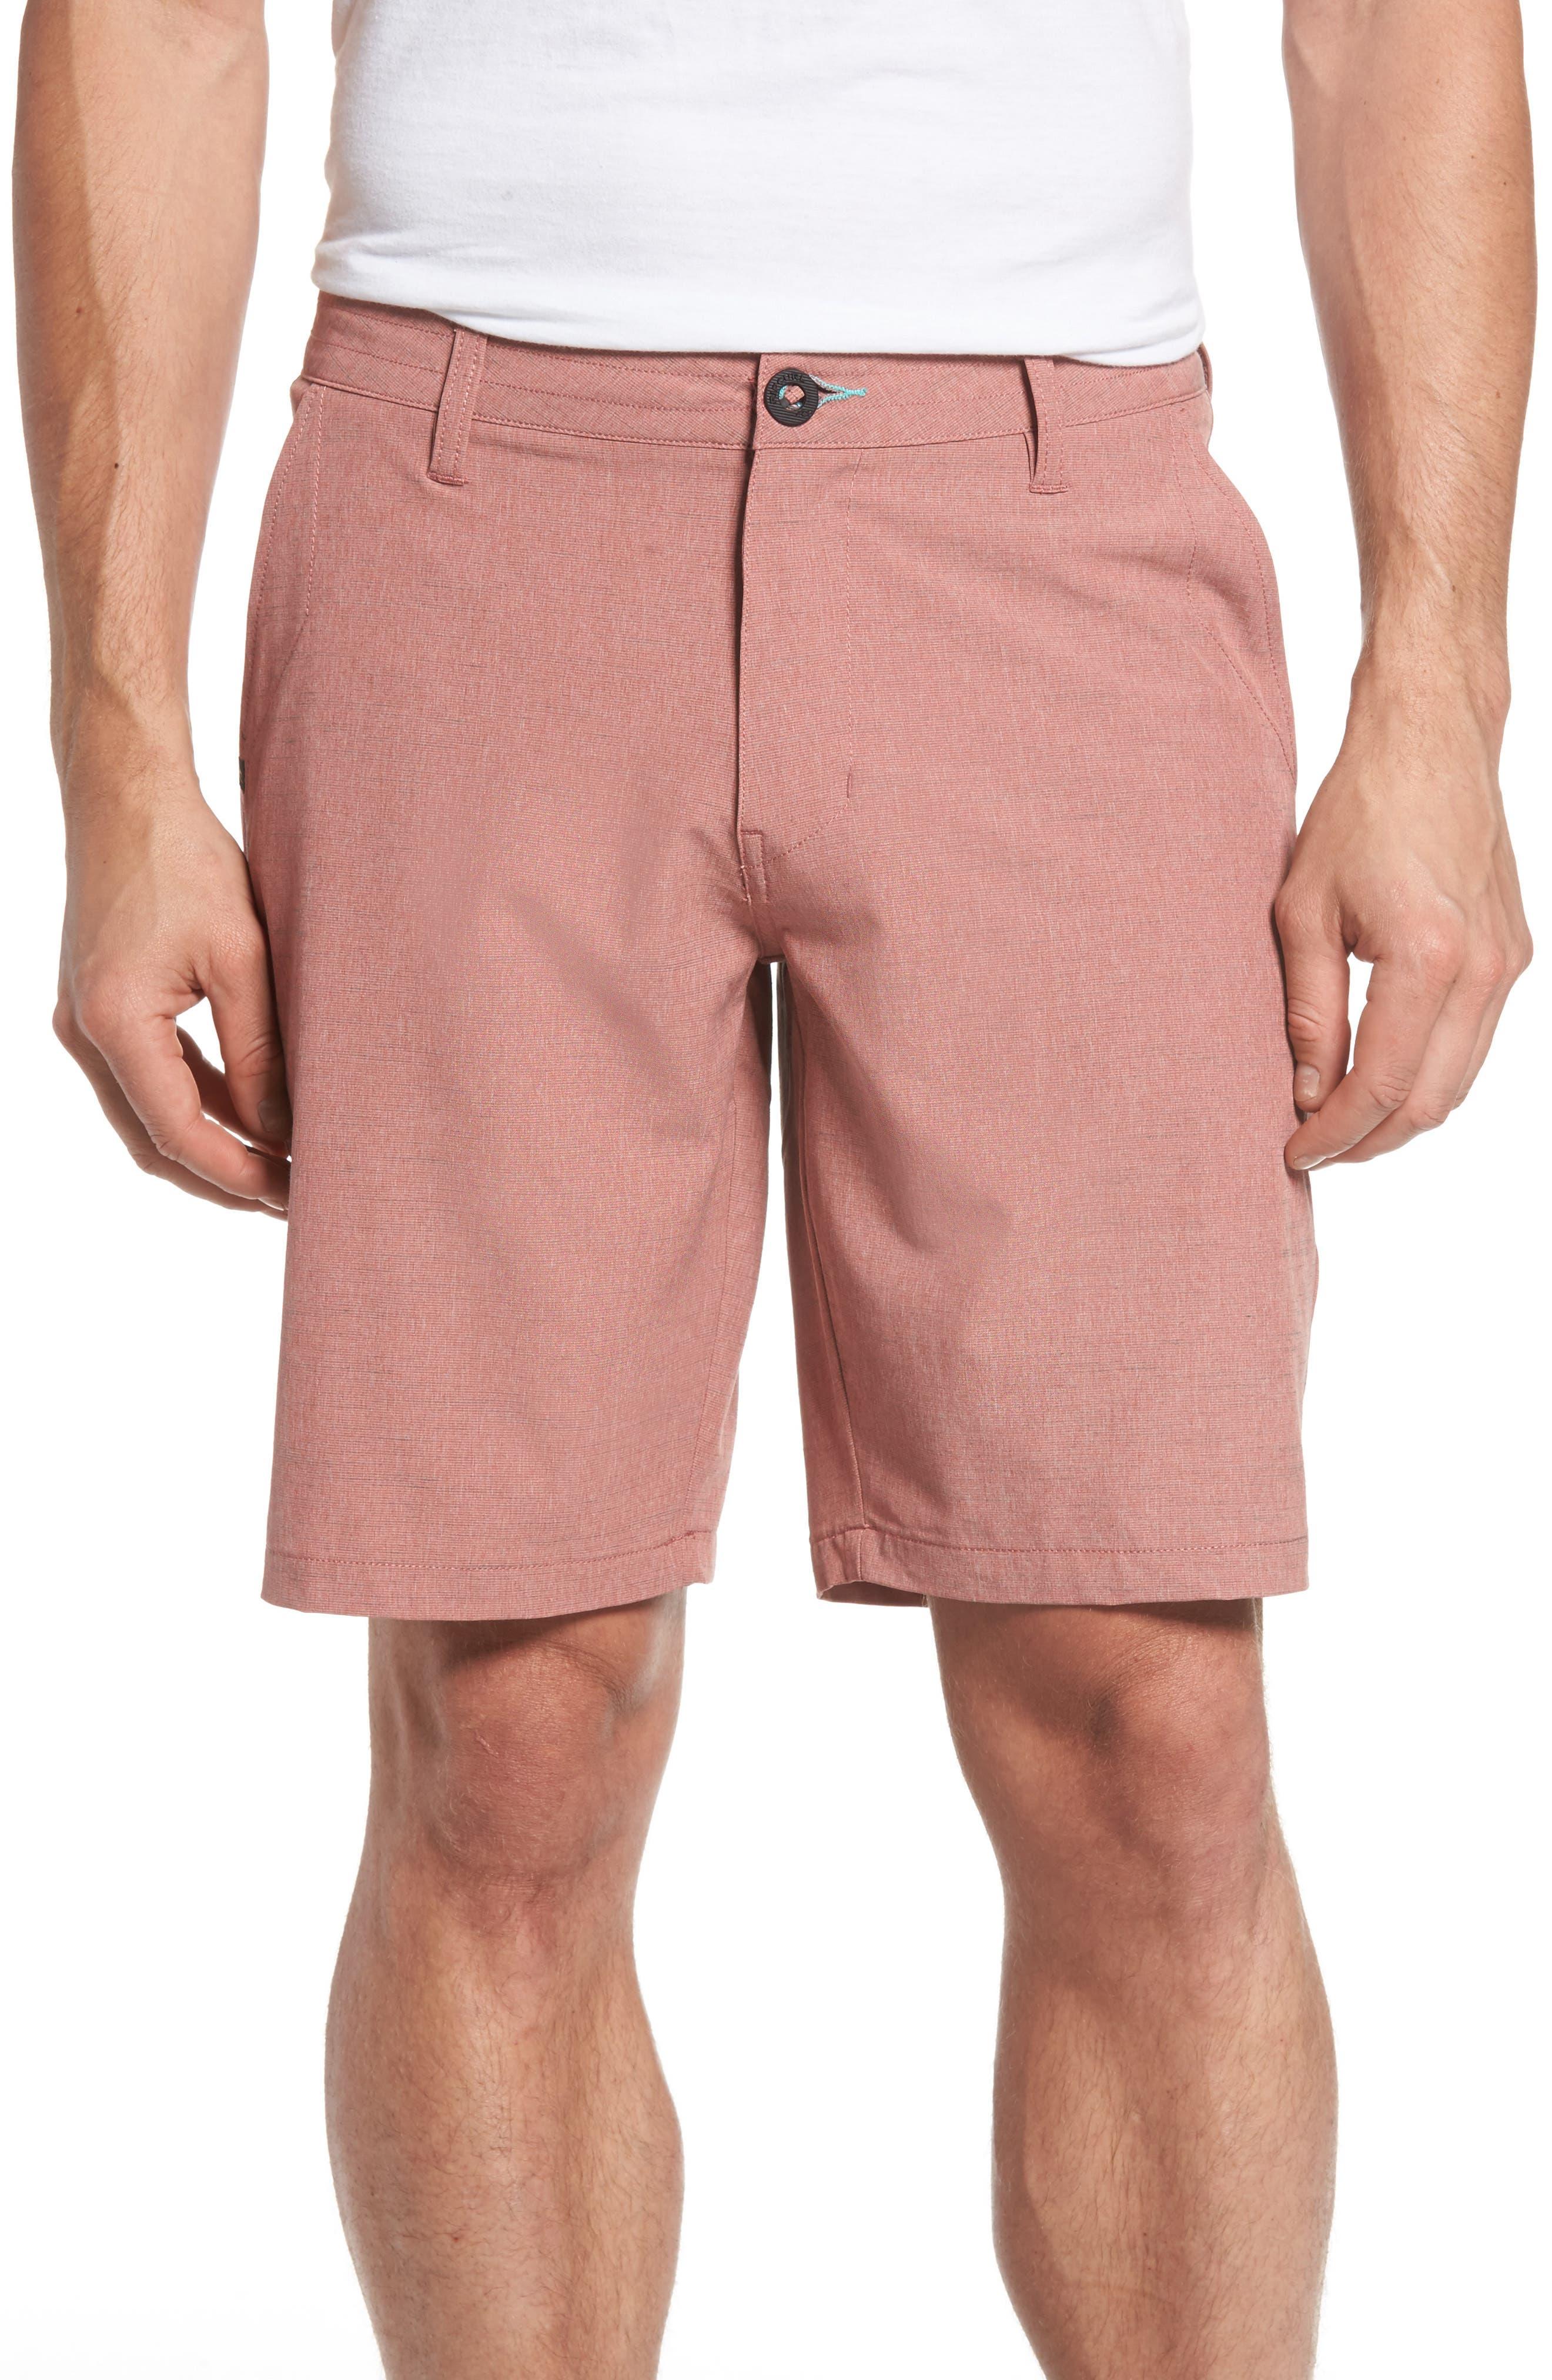 Rip Curl Harper Boardwalk Hybrid Board Shorts